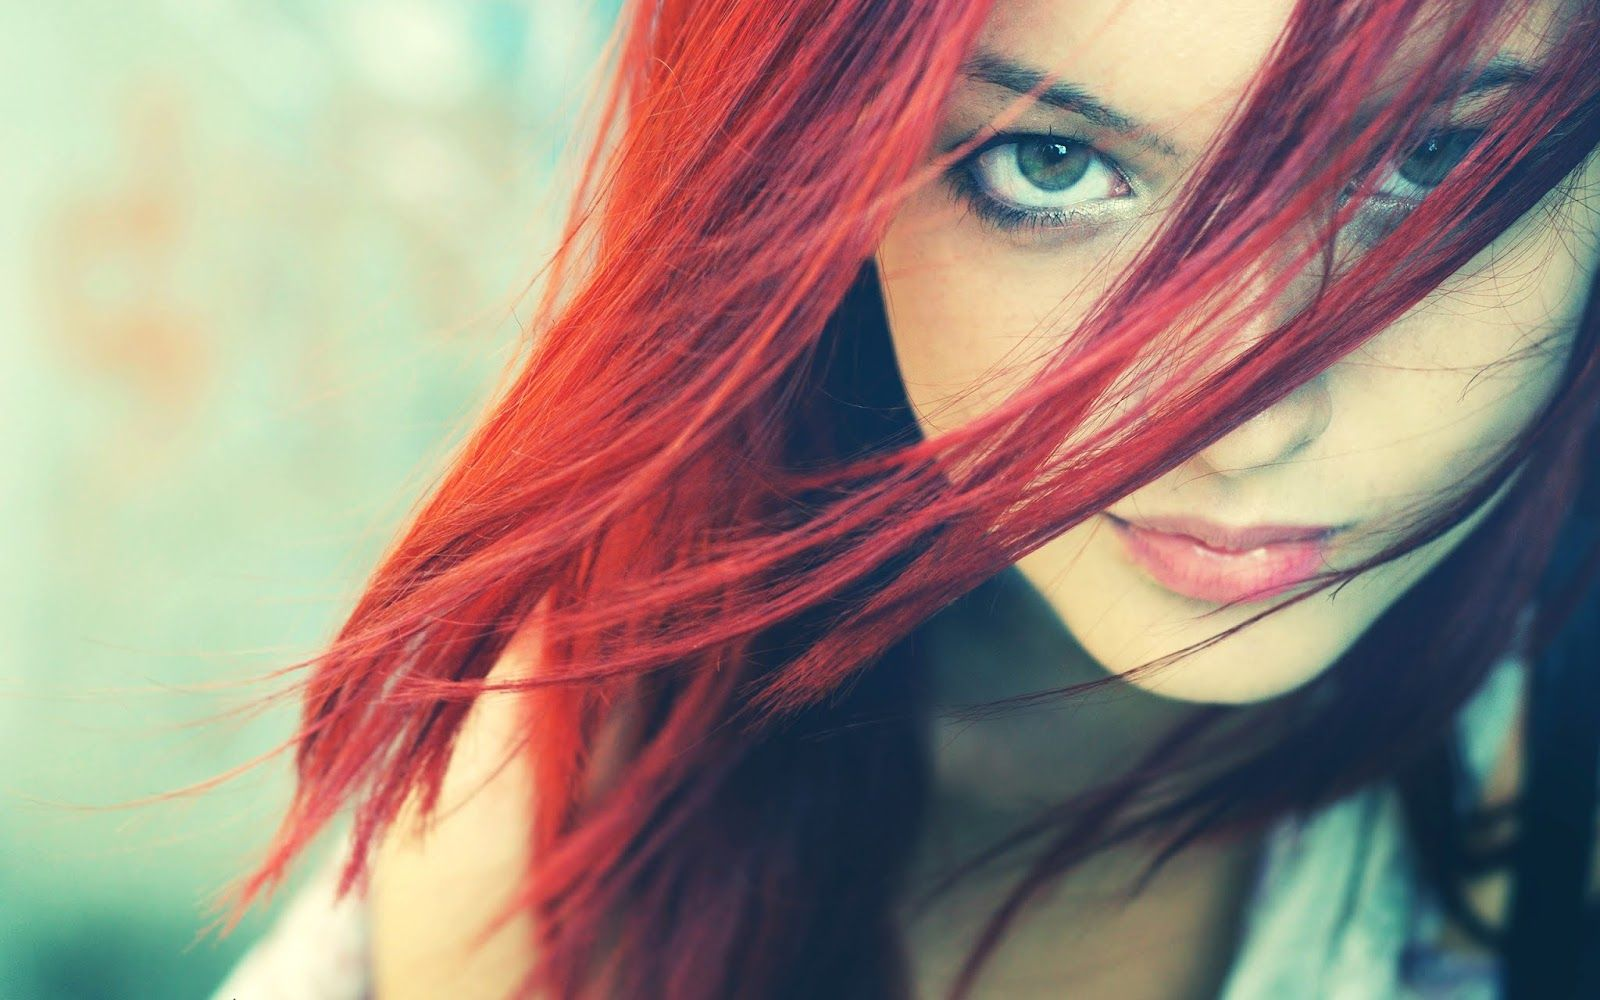 The Hottest Redhead Girlsاجمل واروع بنات شعر احمر Wallpapers Pretty Girl Face Redhead Beauty Redhead